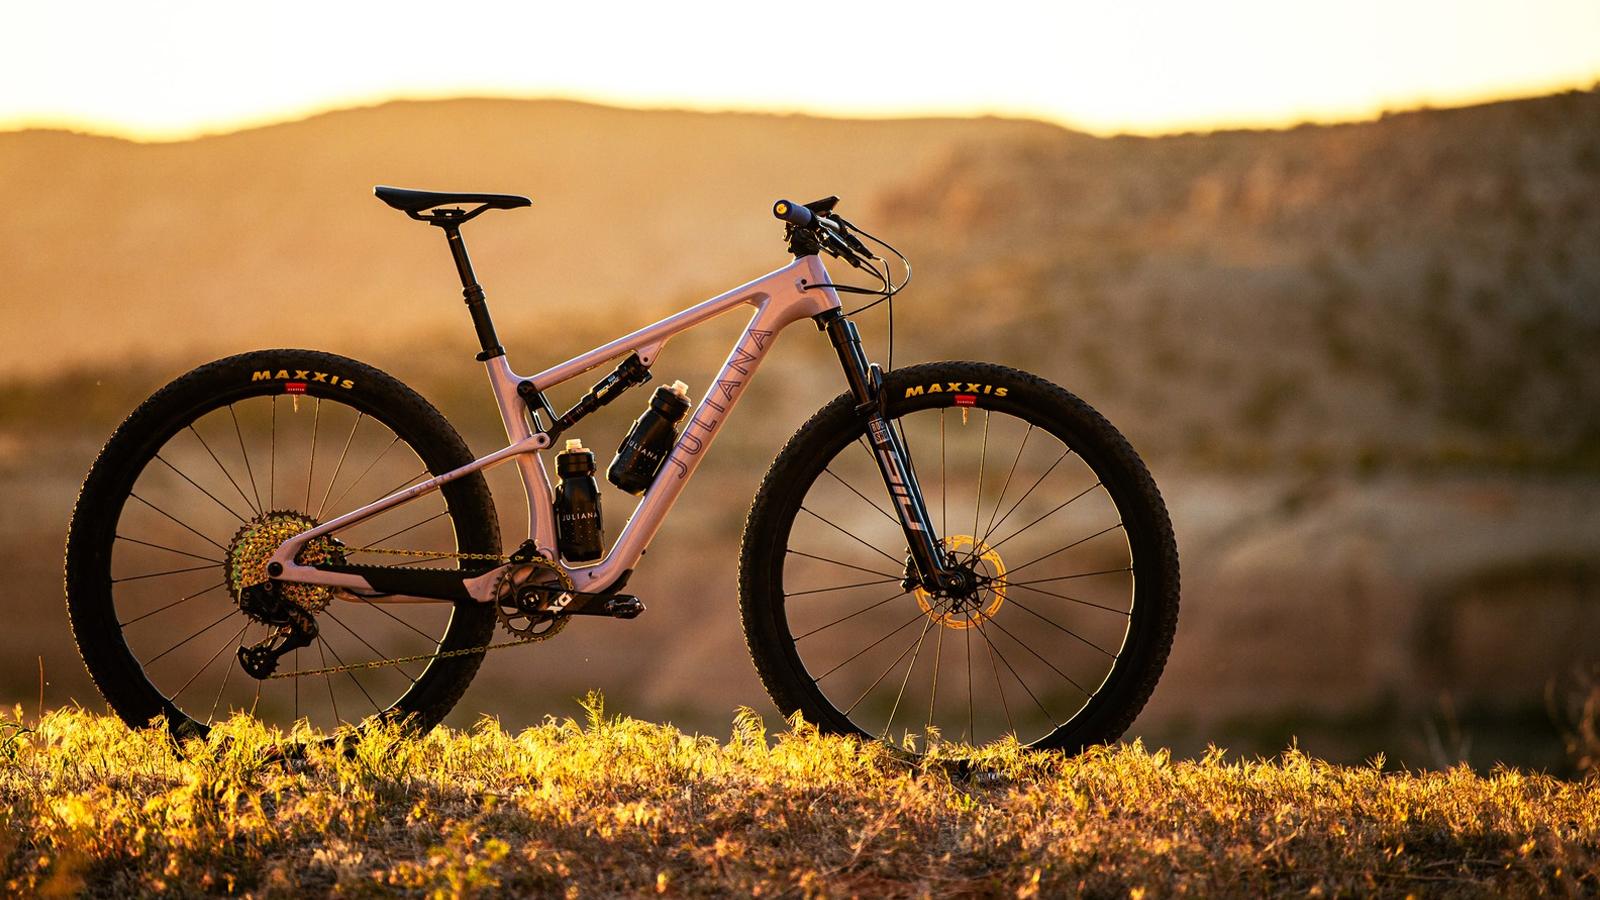 Where to buy a mountain bike